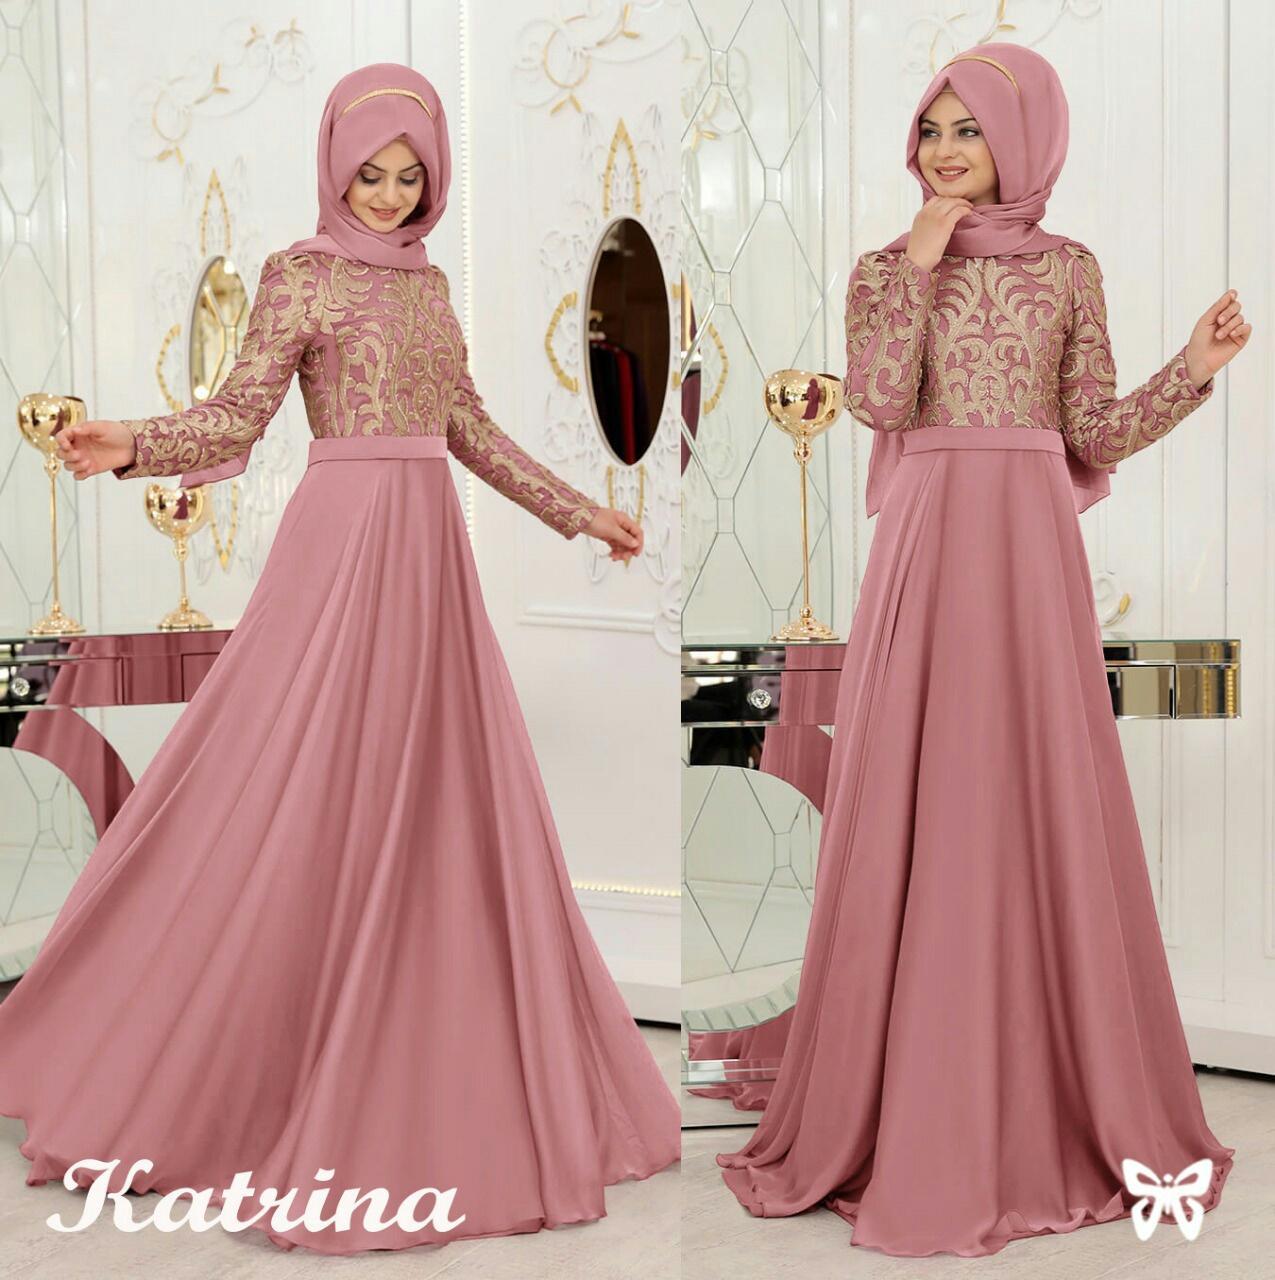 FJCO SIS Katrina / Maxi Dress wanita / Fashion wanita / Fashion Muslimah